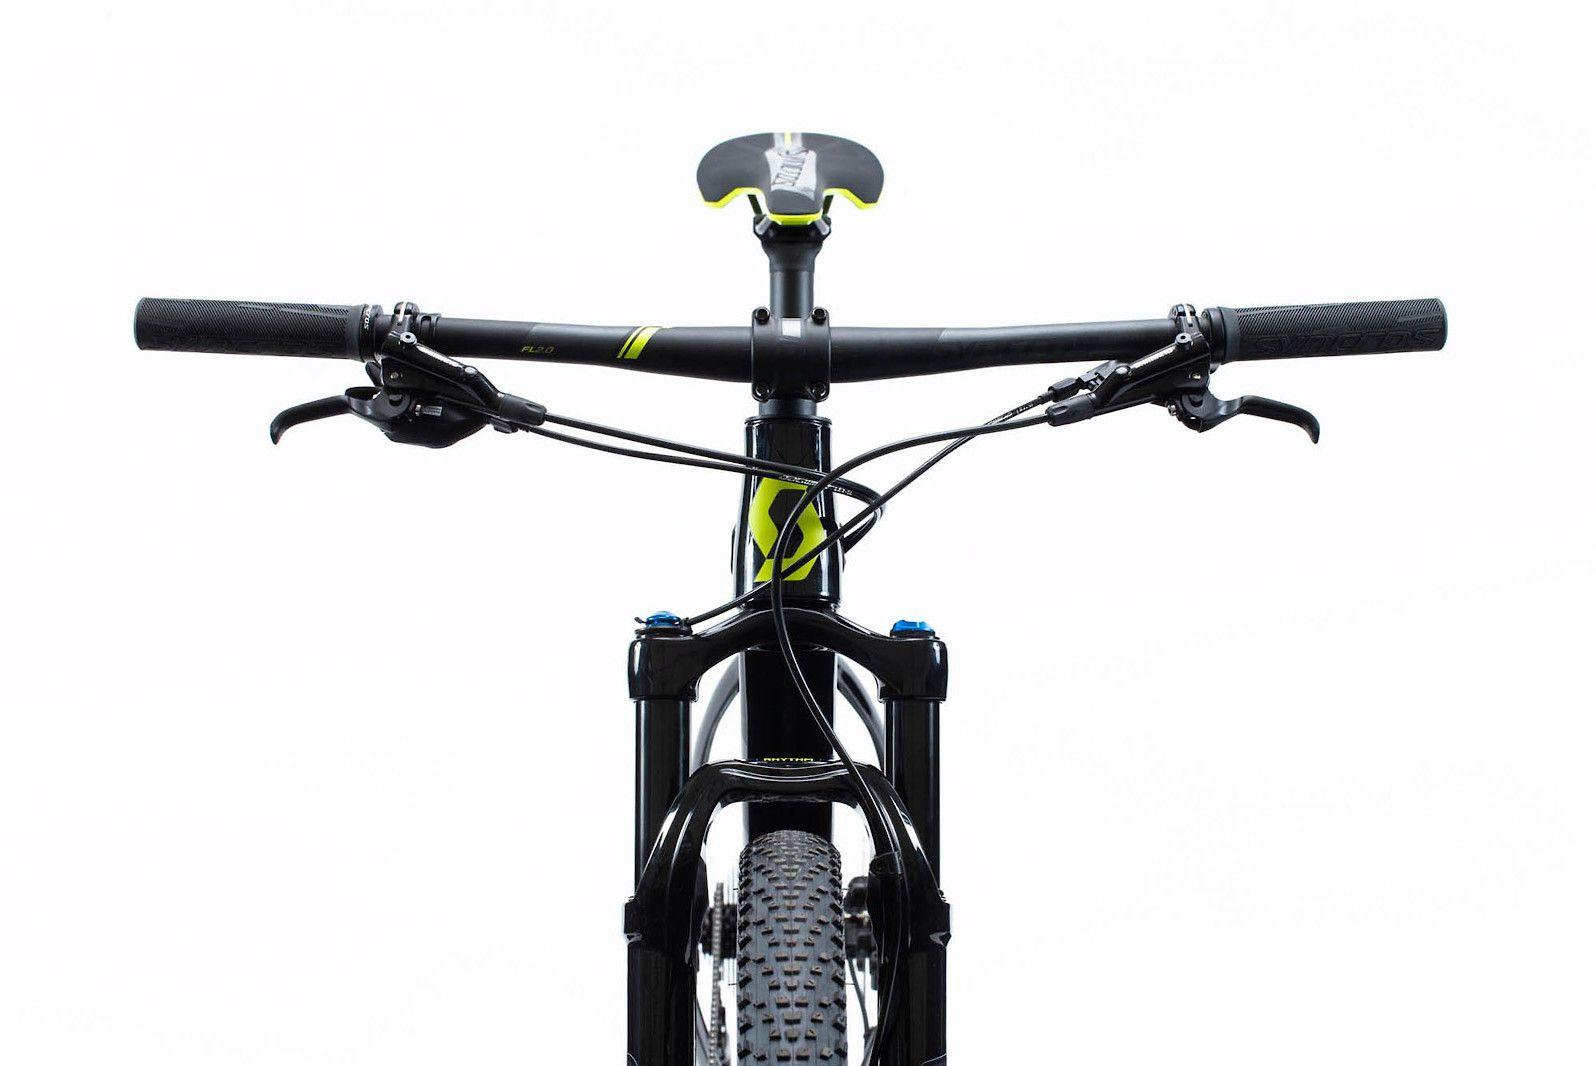 2019 Scott Scale 950 Bike Scott Scale Bike Bike Prices